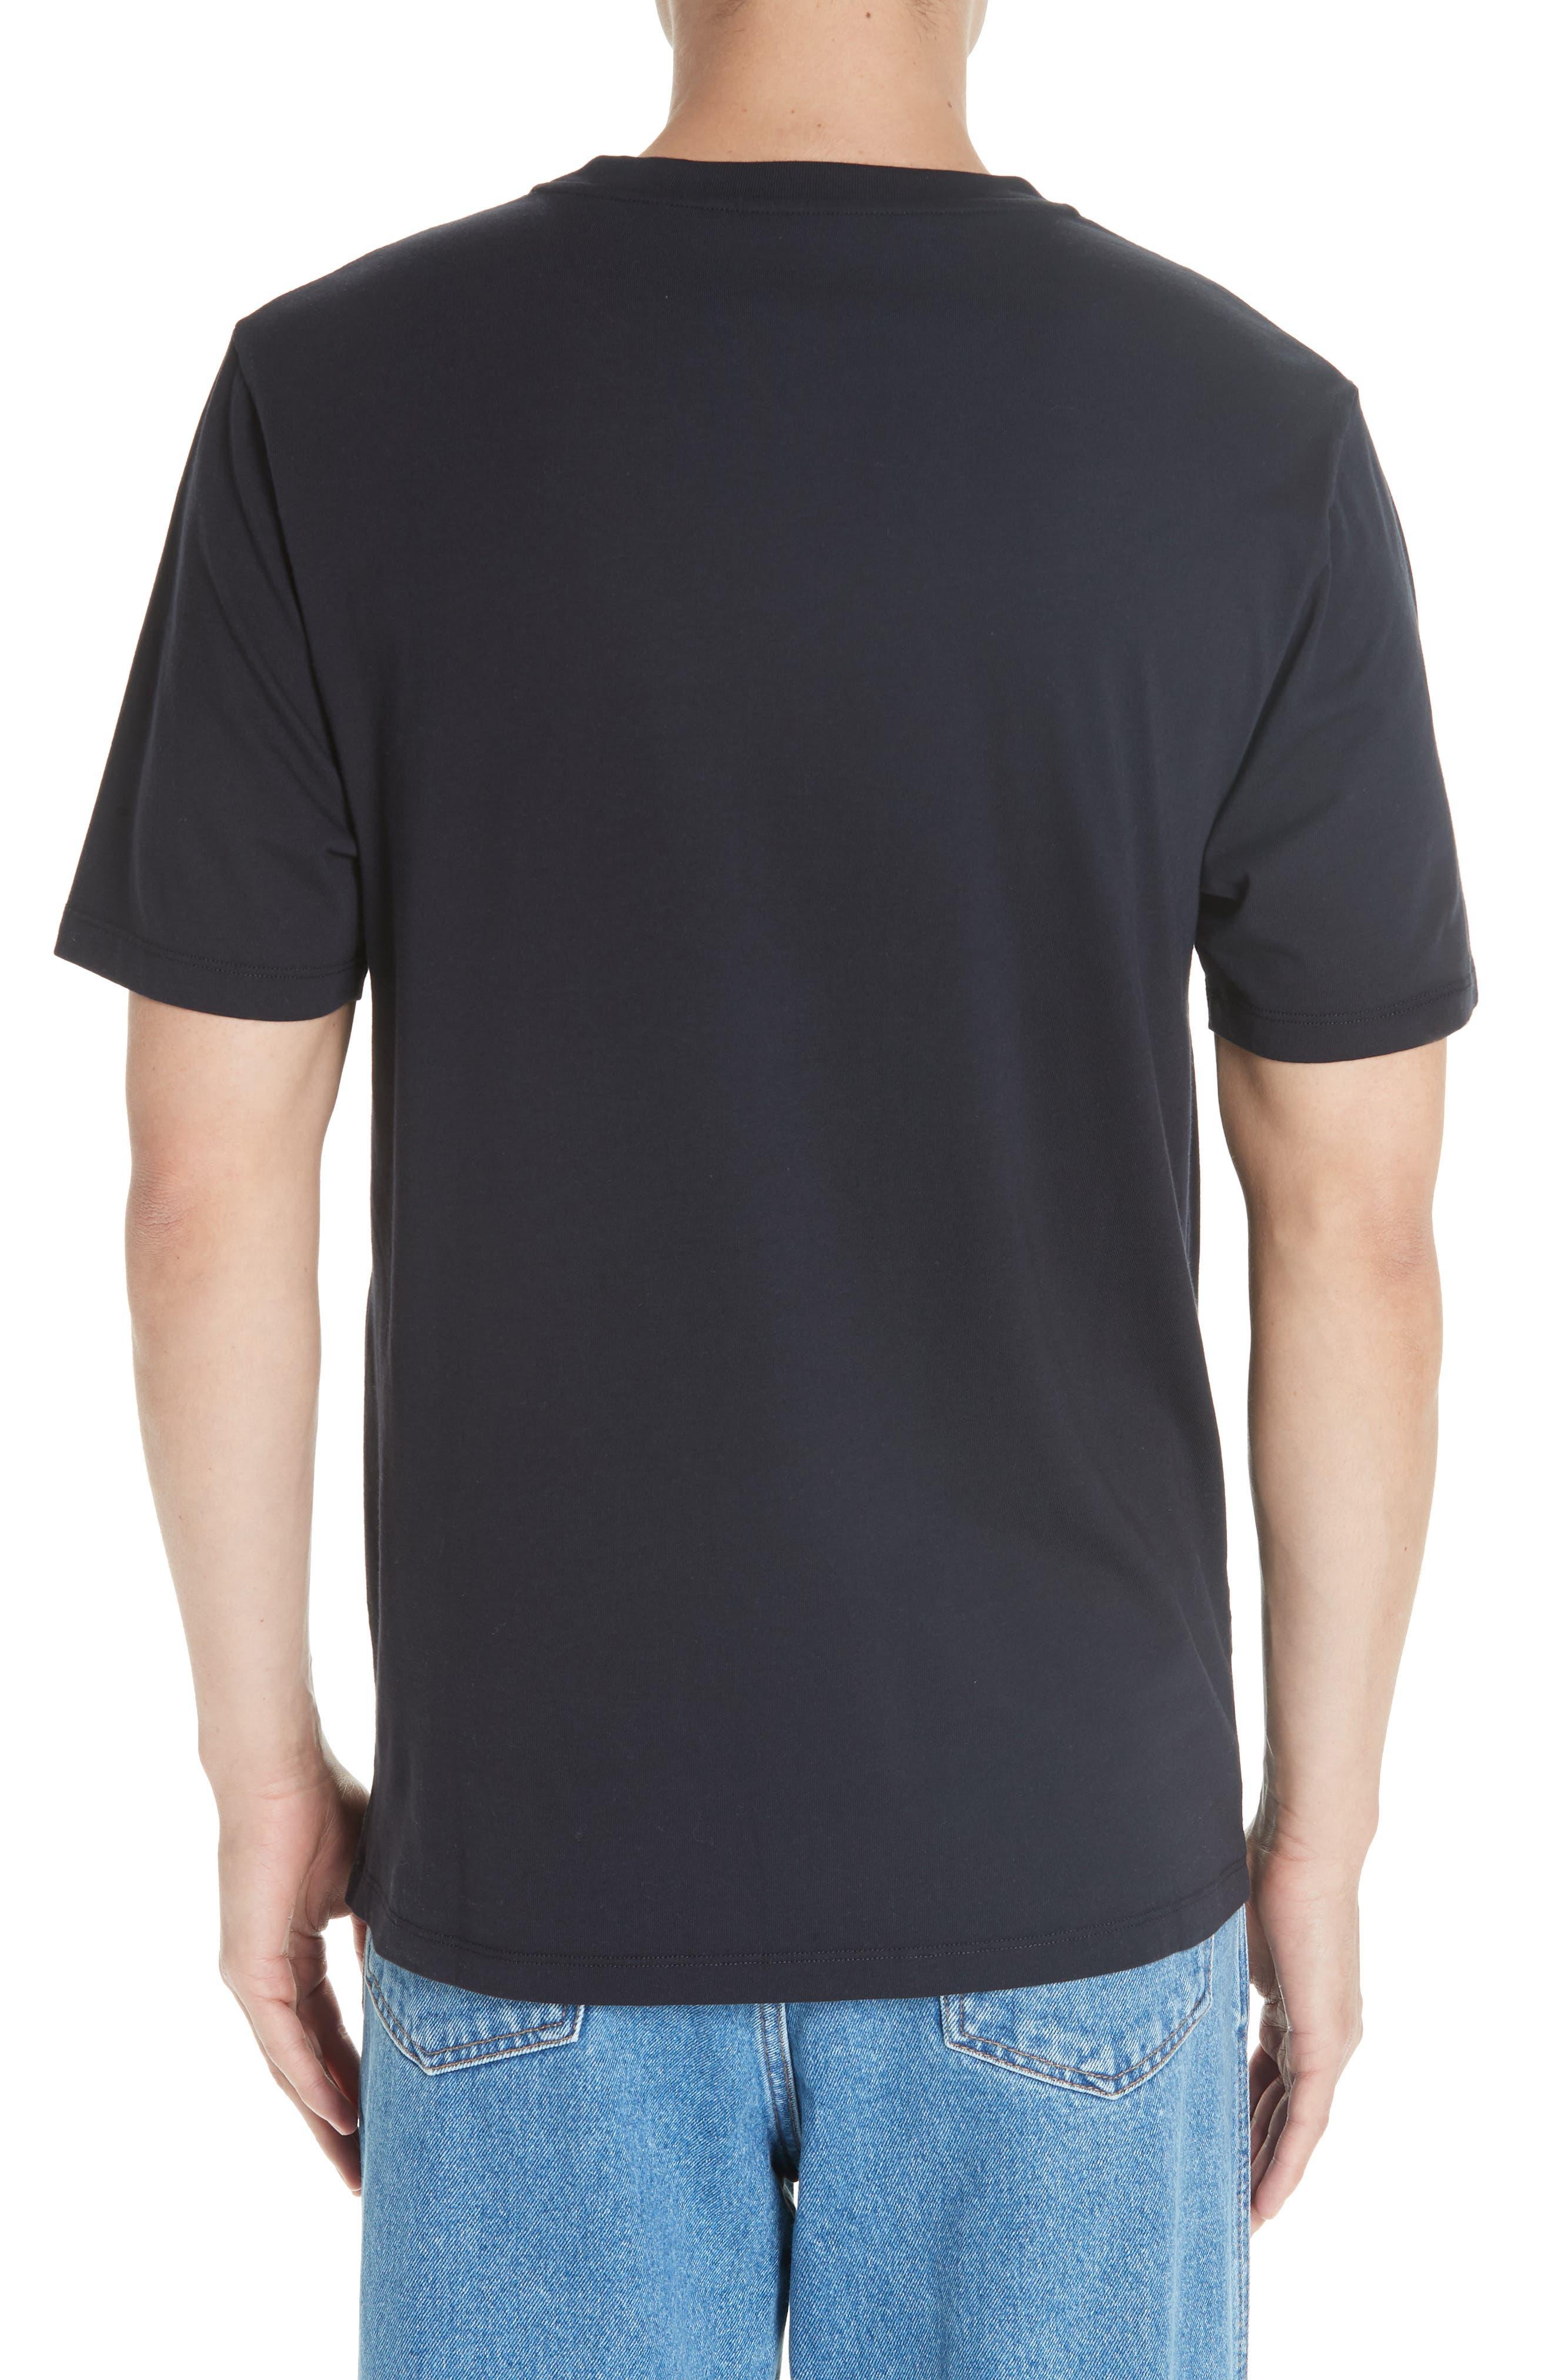 Anagram T-Shirt,                             Alternate thumbnail 2, color,                             410